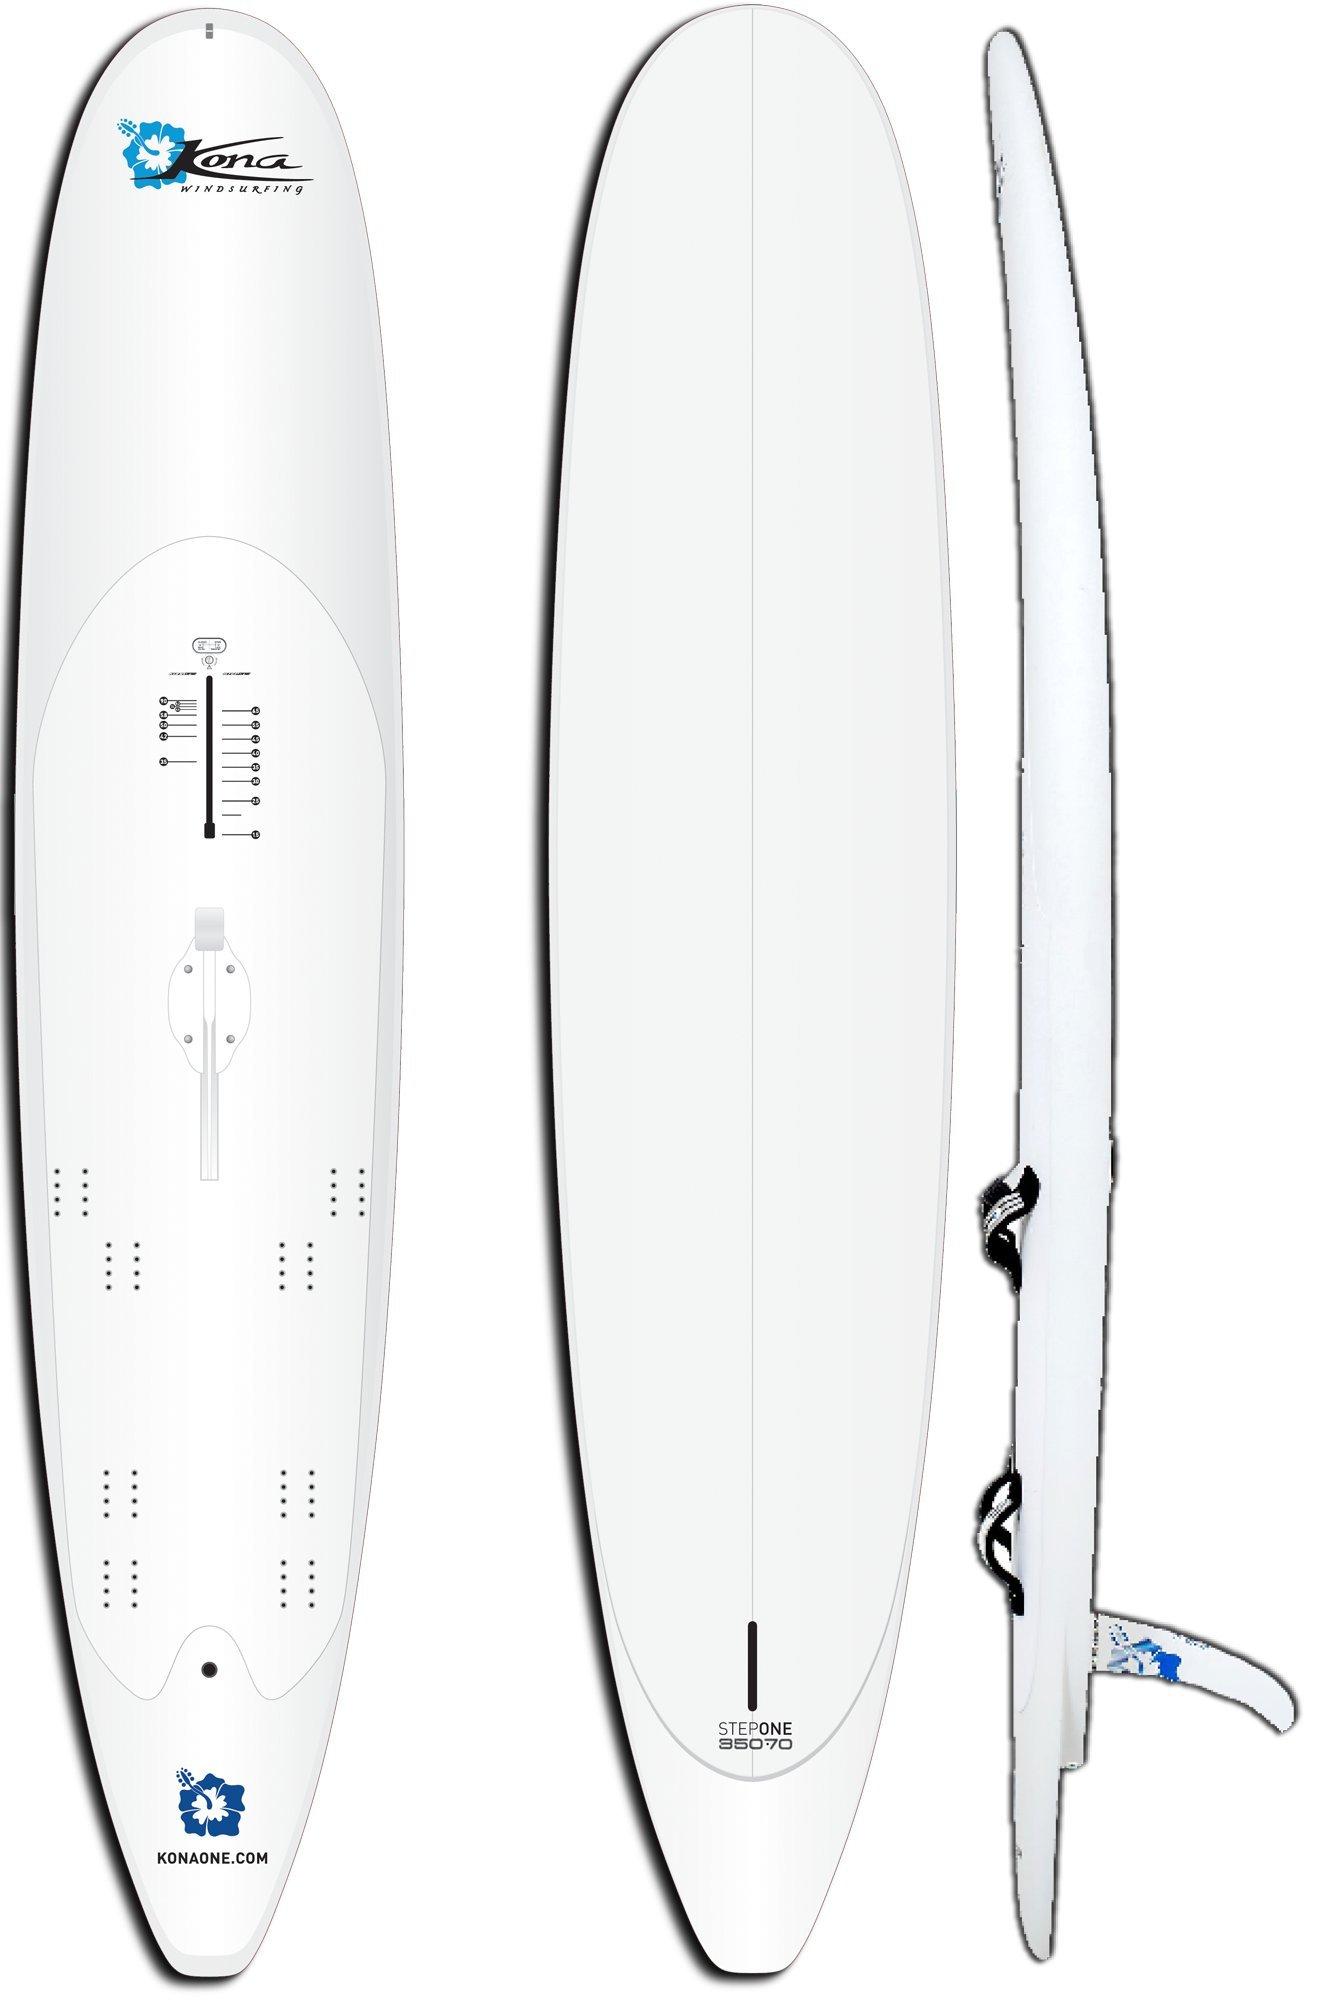 Kona Step One Windsurfing Board